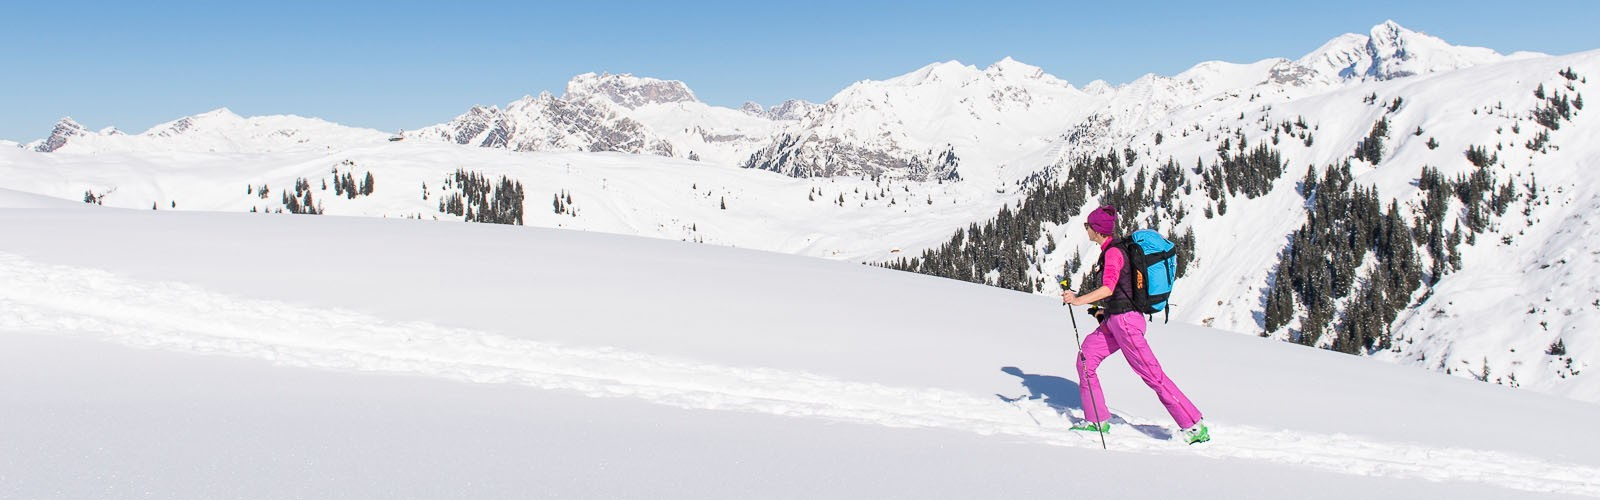 günstige ski ausrüstung